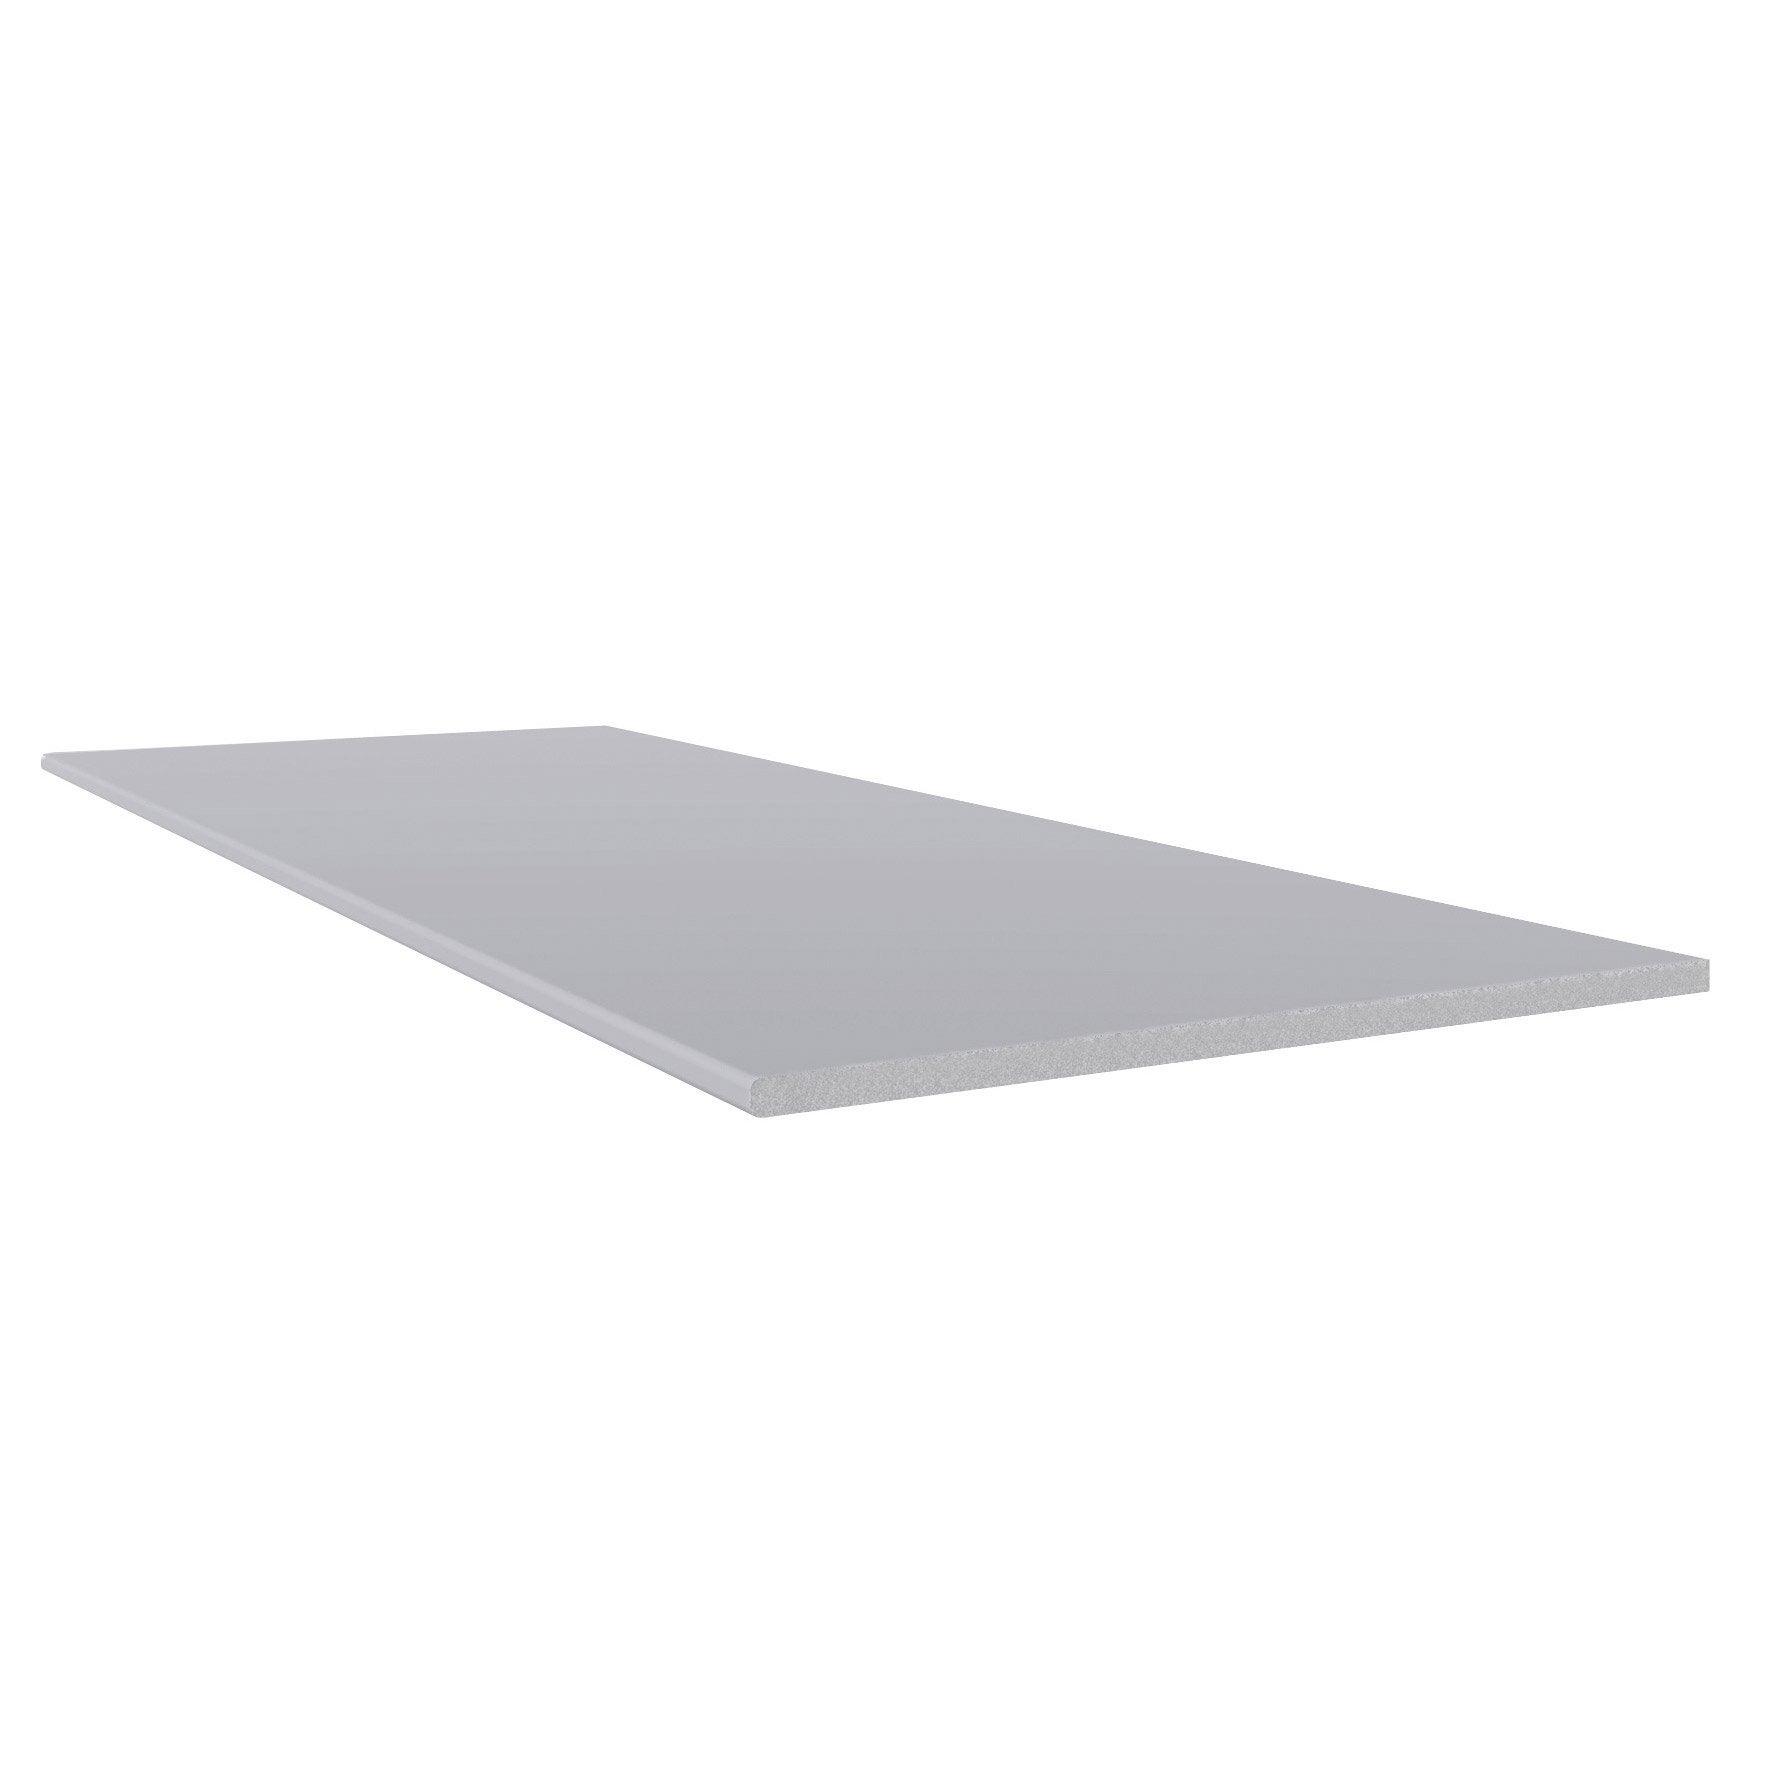 Planche Plate Pvc Freefoam Faza Solid Gris 3 M